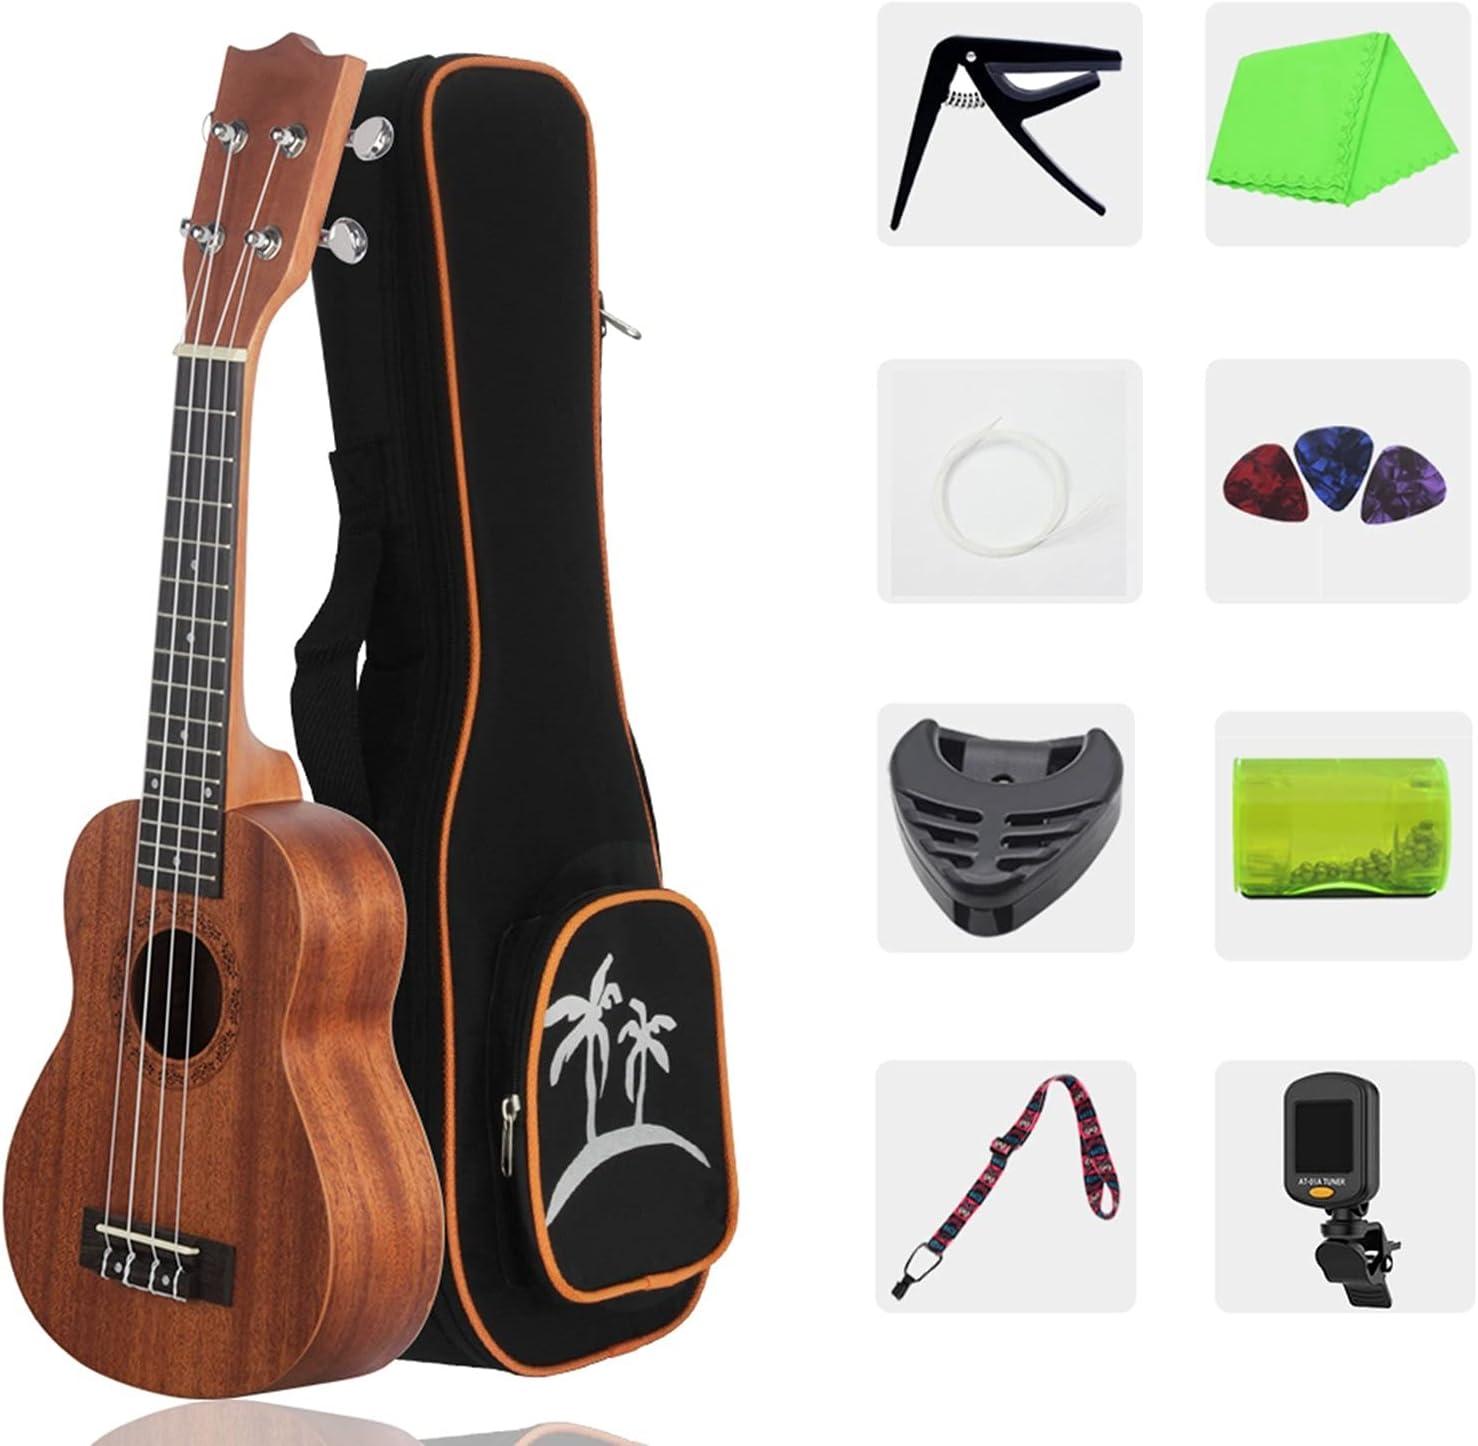 Soprano Ukulele SALENEW very popular! 23 Inch Concert Strings Bag with Strap Max 90% OFF C